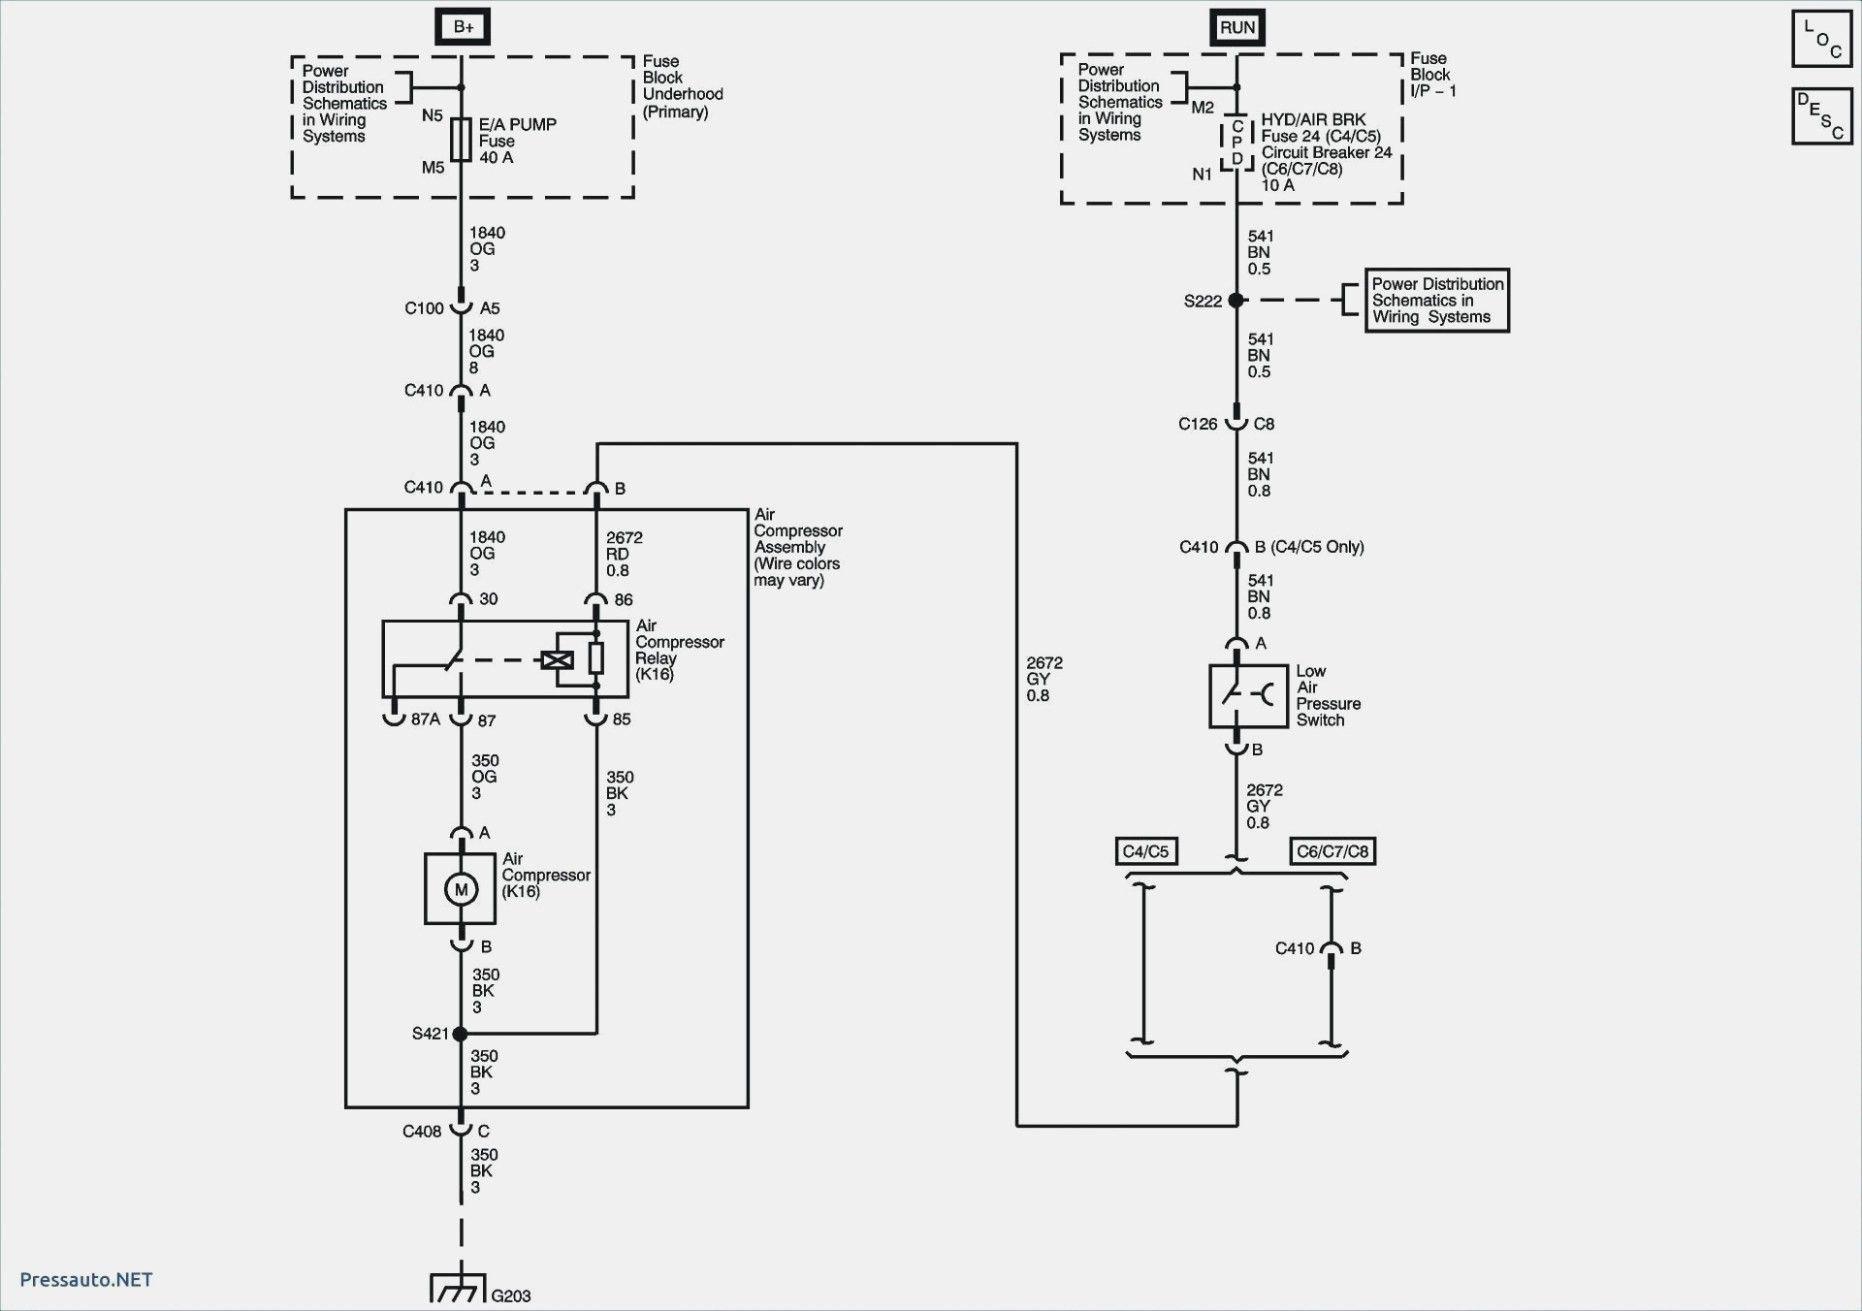 Inspirational Bennett Trim Tab Switch Wiring Diagram In 2020 Air Compressor Switch Well Pump Pressure Switch Diagram